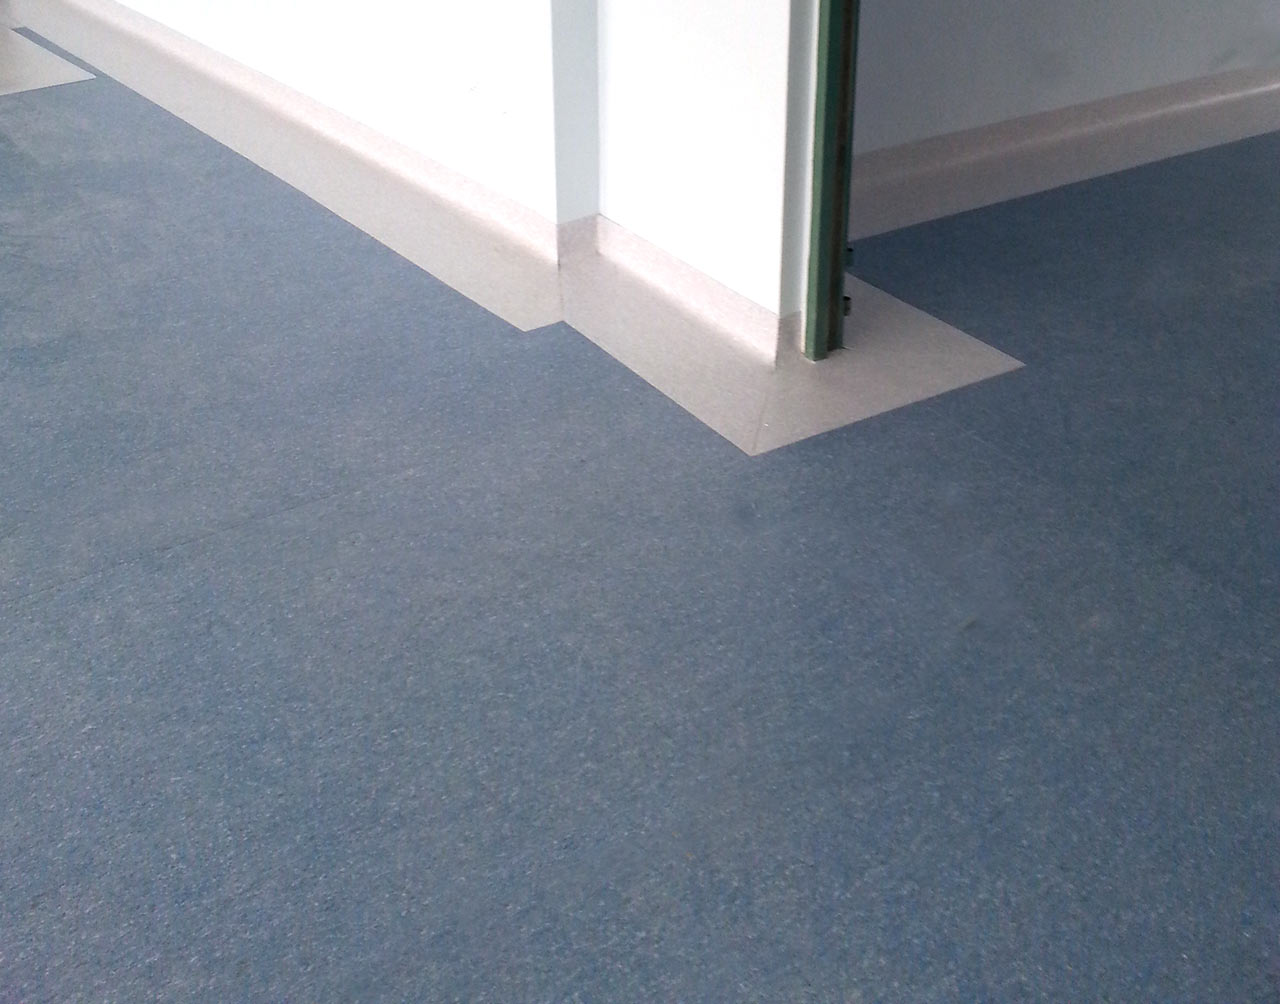 Pavimenti in resina opinioni simple pavimenti in resina for Pavimenti x esterni ikea